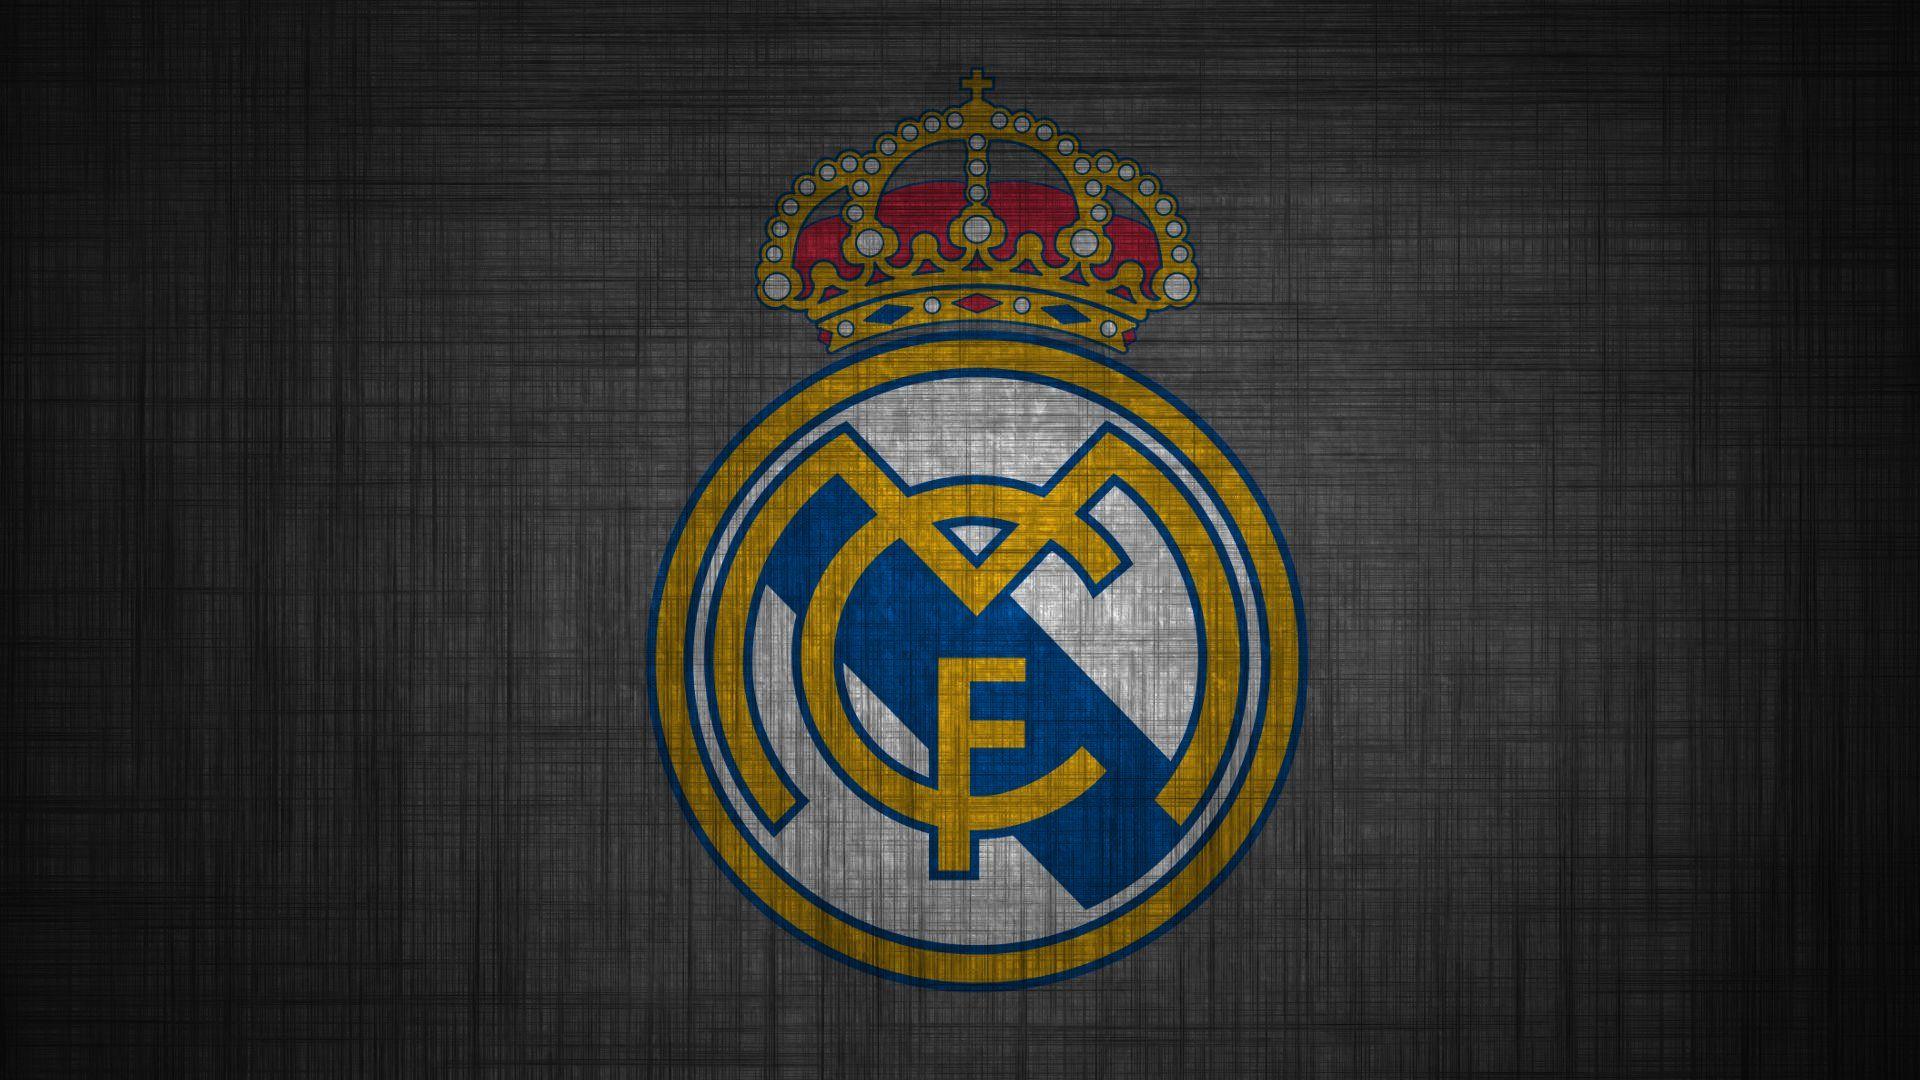 28 Real Madrid Logo Wallpaper 2017 On Wallpapersafari